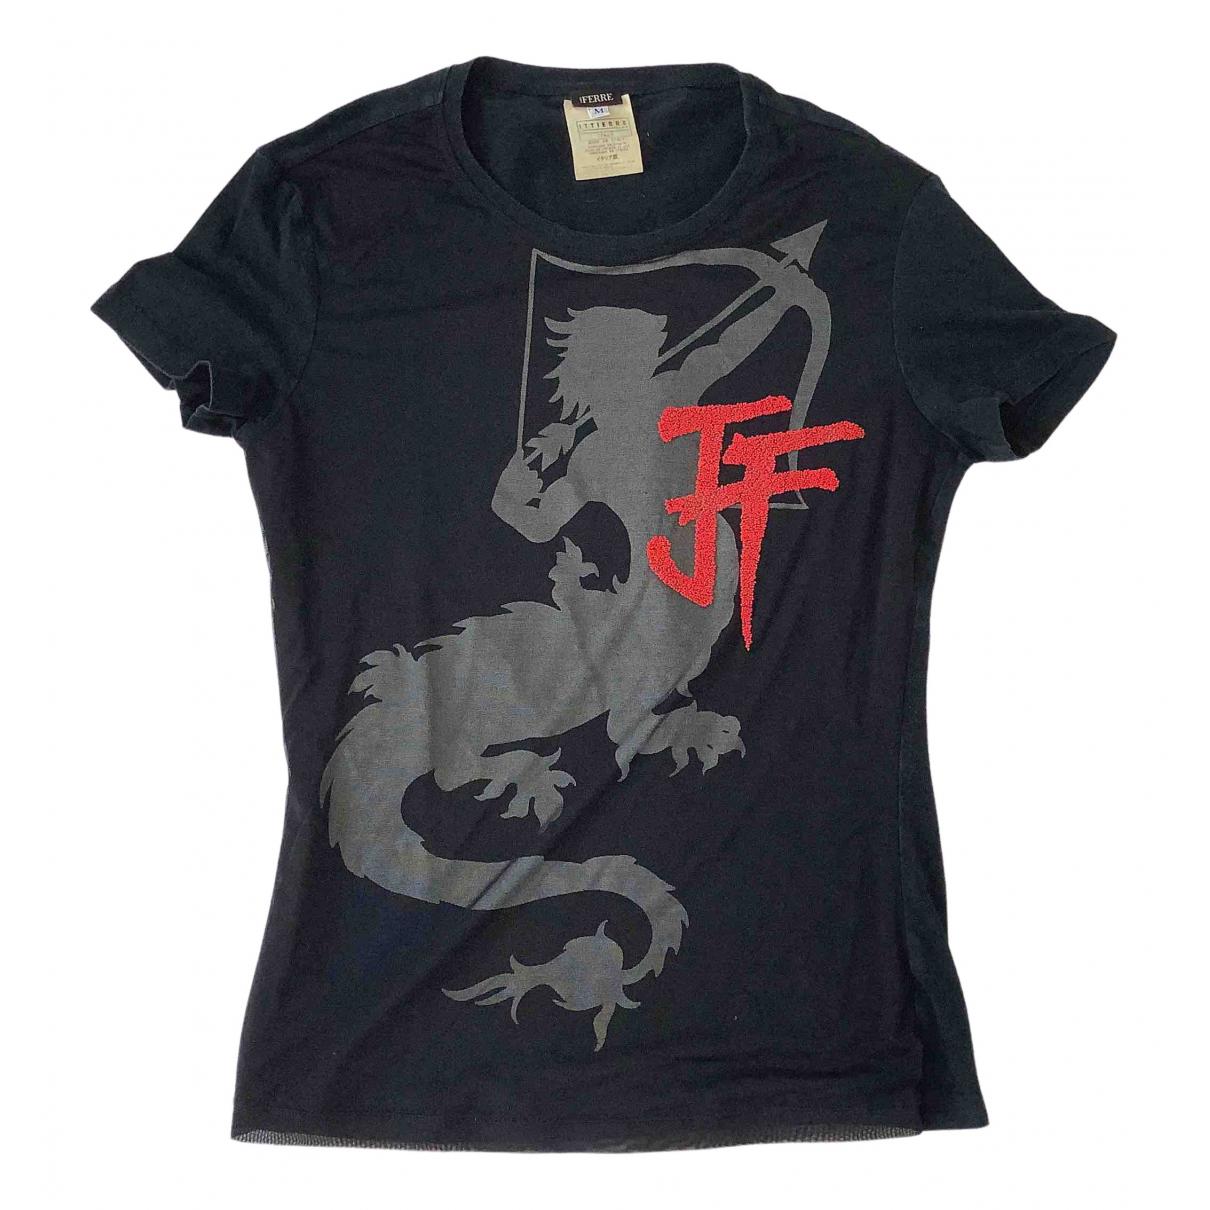 Gianfranco Ferré \N Black Cotton  top for Women M International